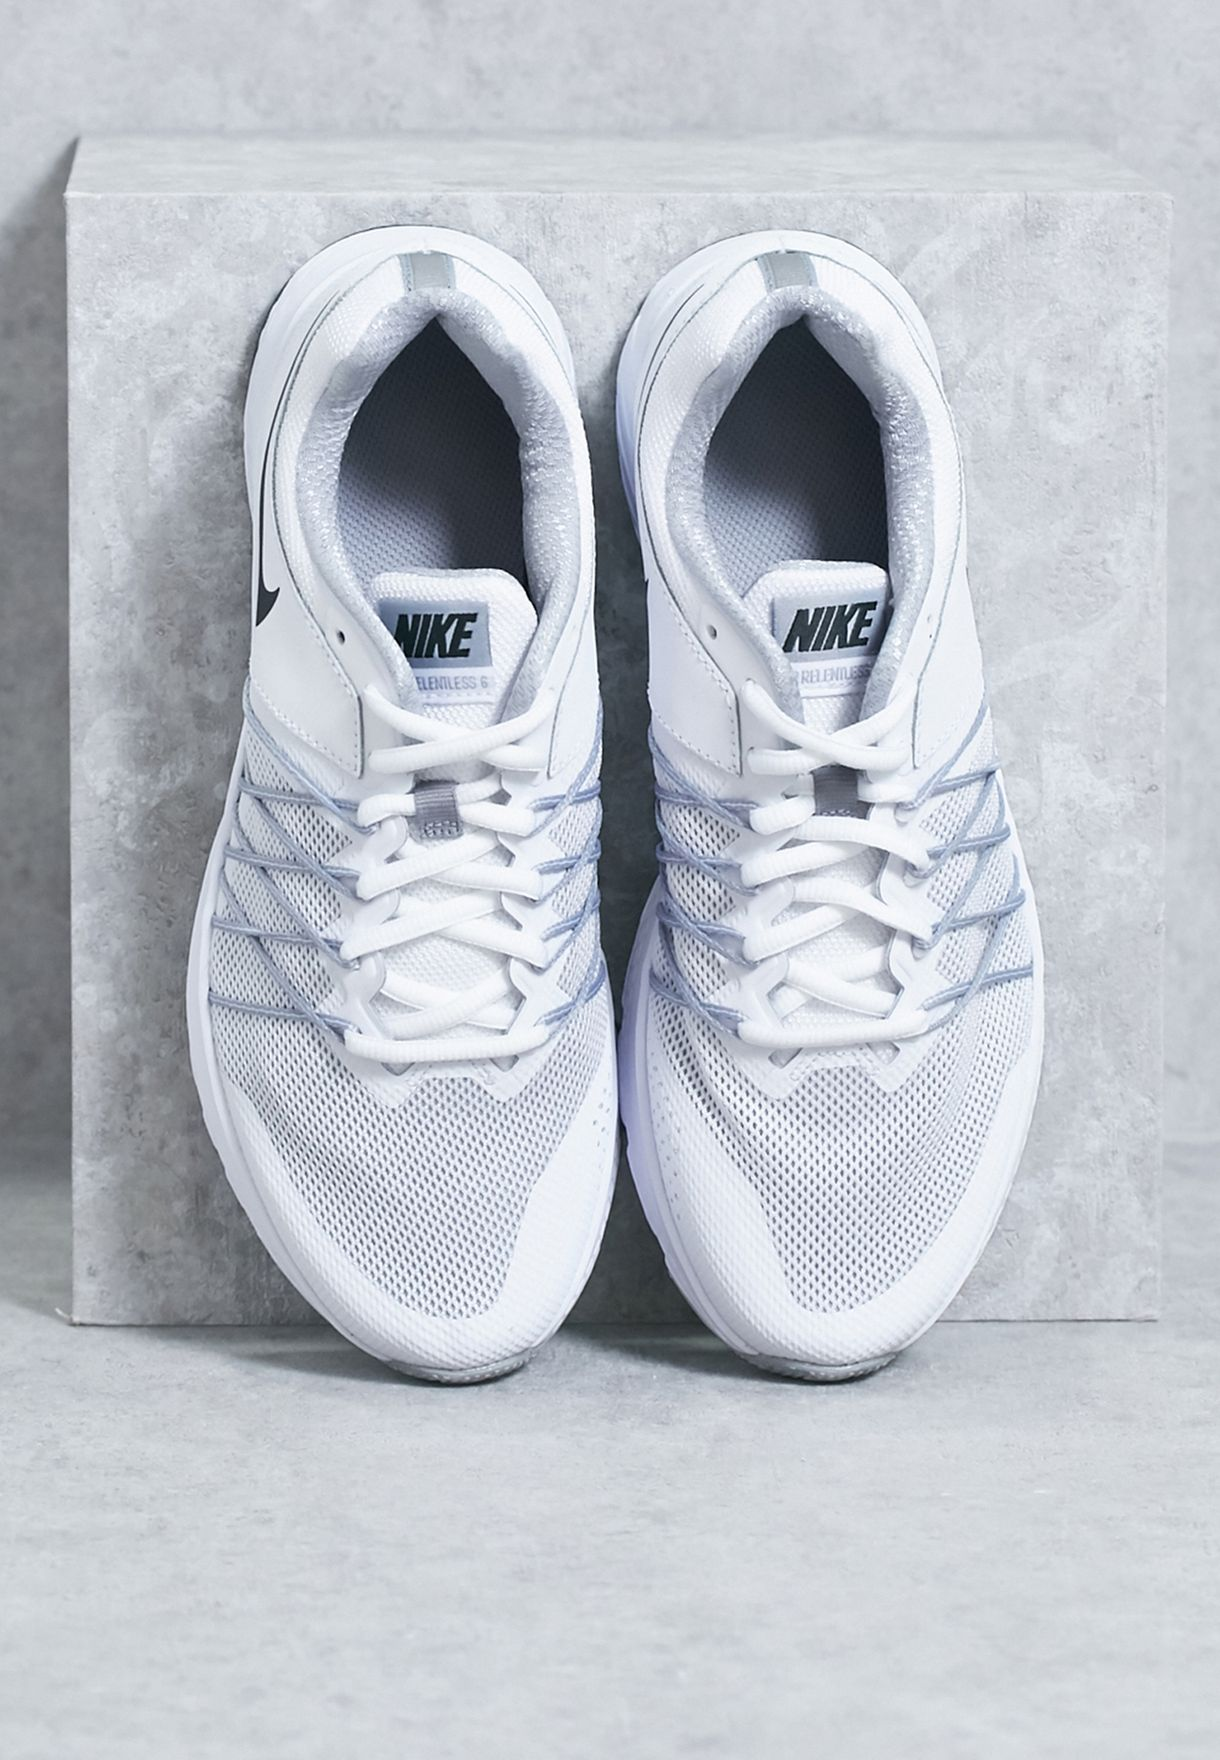 e94749323a7 Shop Nike white Air Relentless 6 843882-100 for Women in Saudi ...